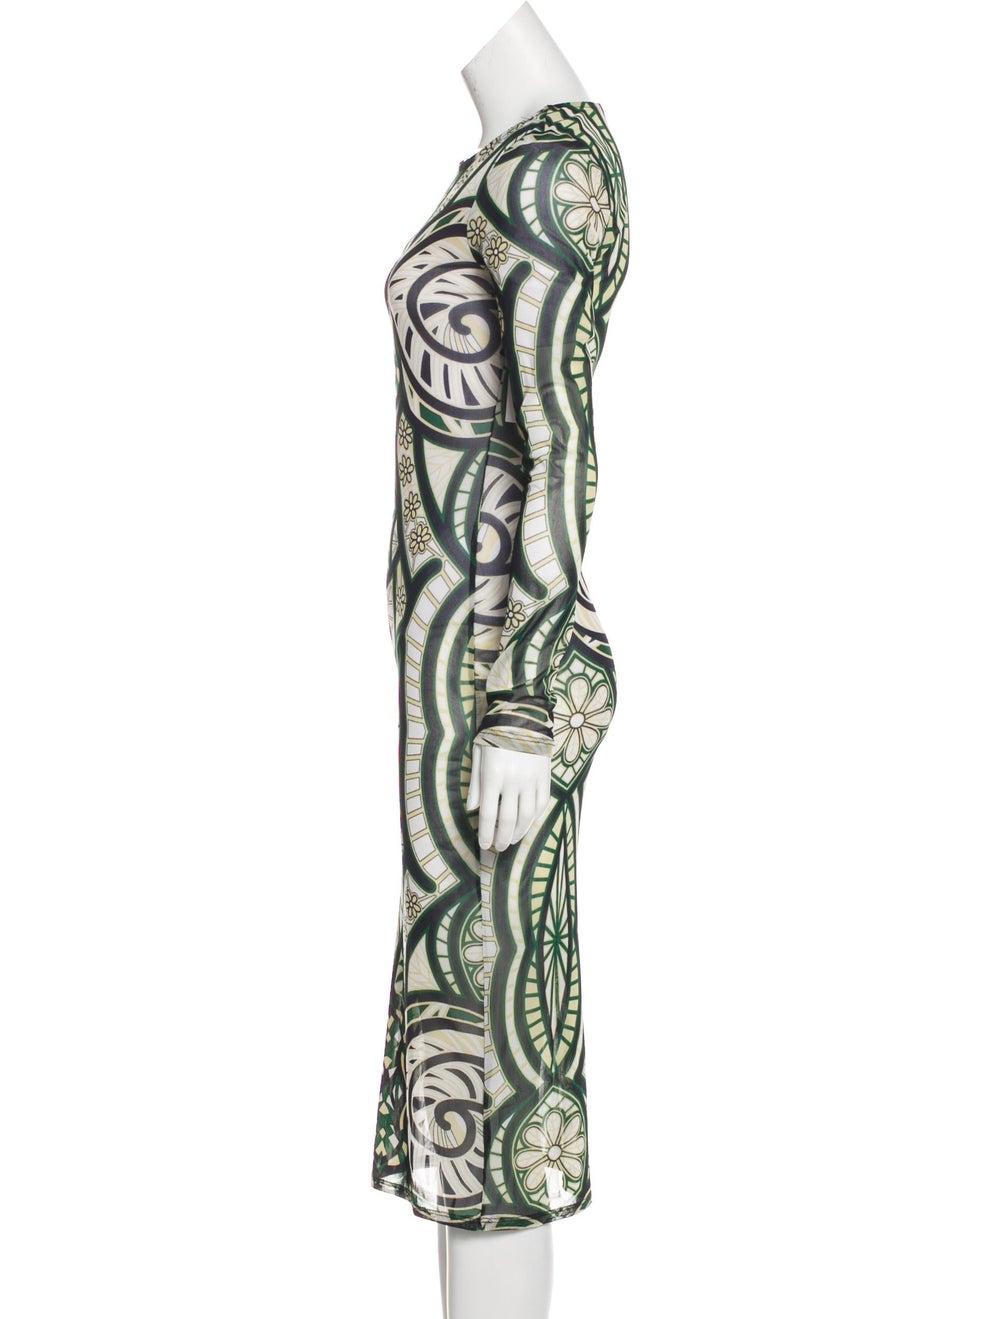 Isabel Marant Knit Midi Dress Green - image 2